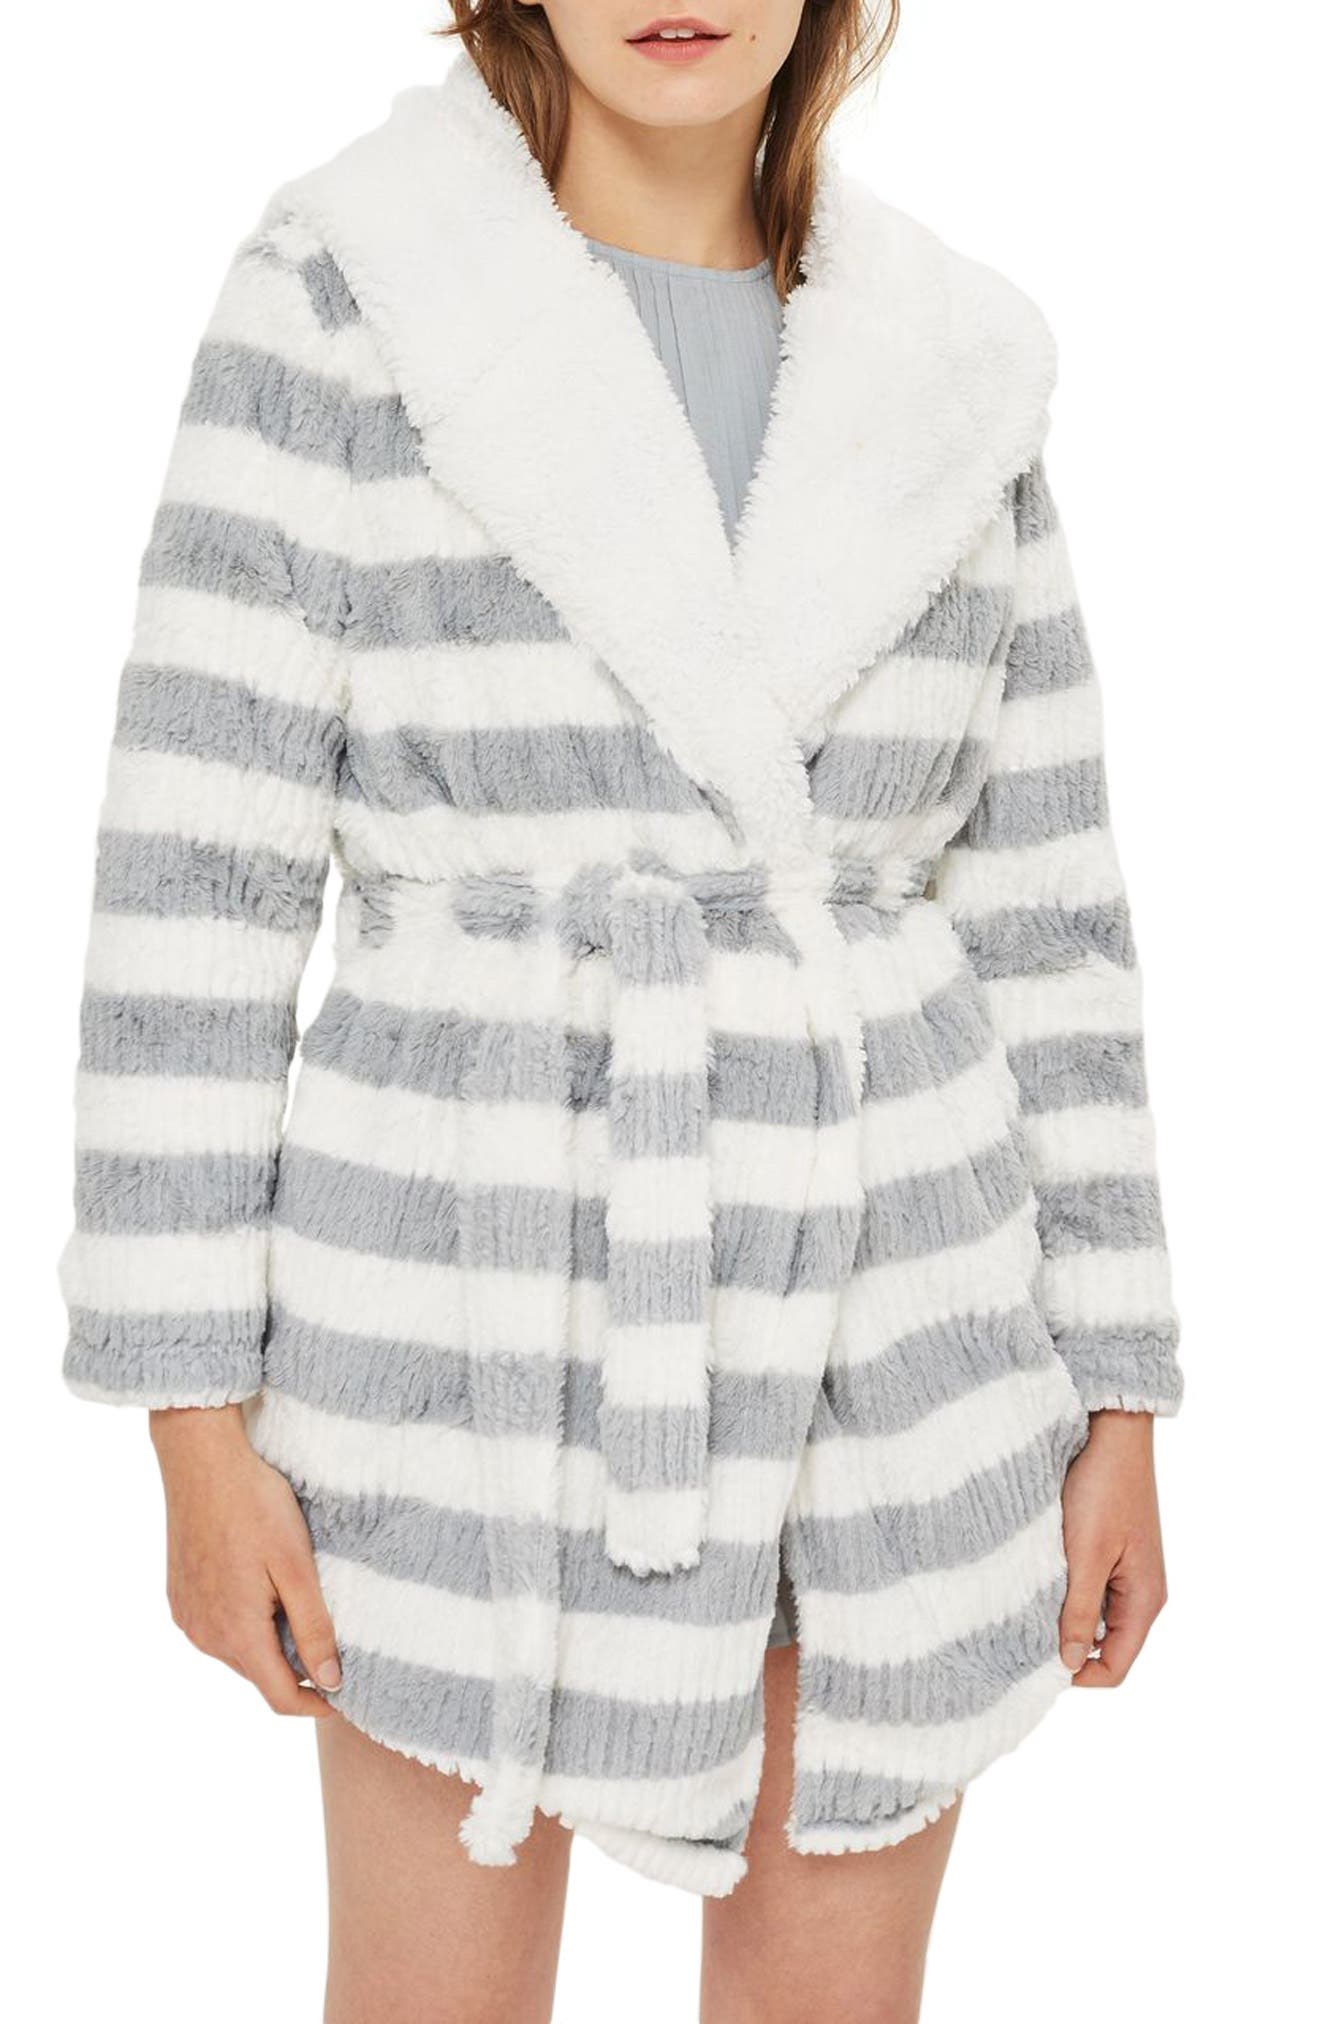 Stripe Short Robe,                         Main,                         color, 020